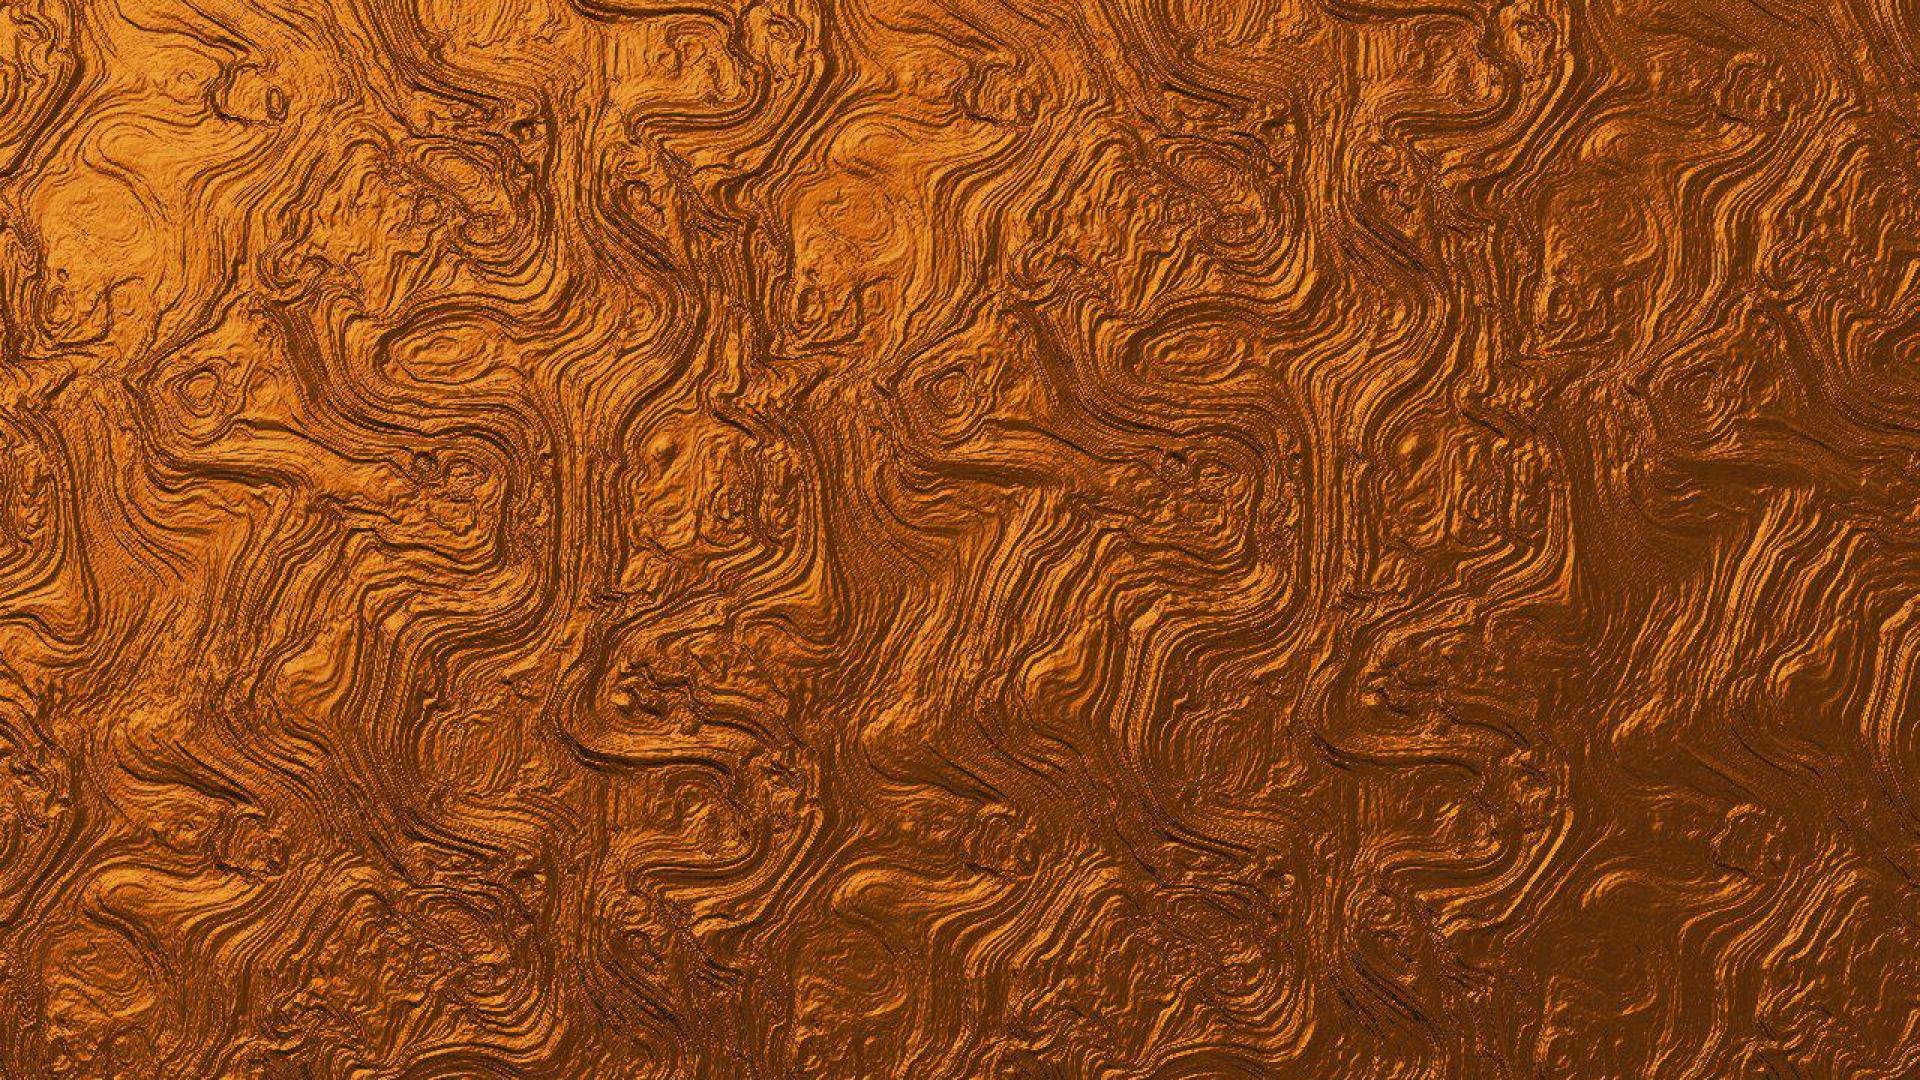 Widescreen resolutions (16:10): 1280x800 1440x900 1680x1050 1920x1200. Normal resolutions: 1024x768 1280x1024. Wallpaper Tags: swirls textured copper